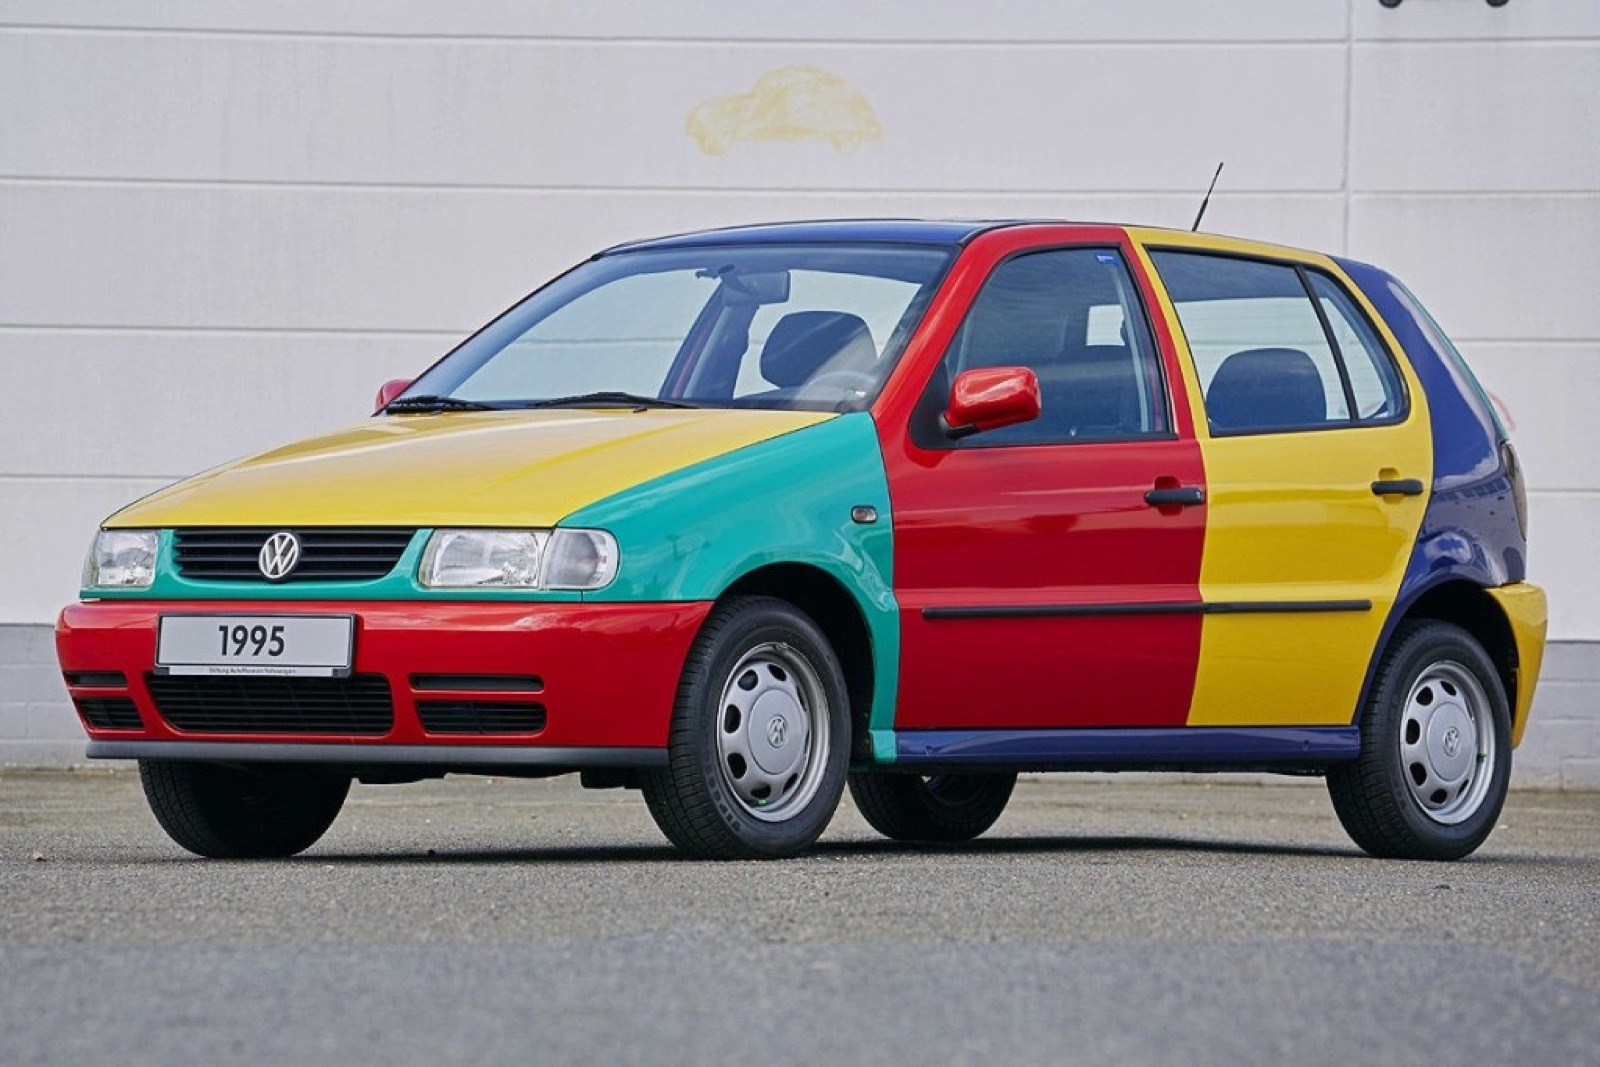 Volkswagen_Netherlands_modern_Polo_Harlekin_0011